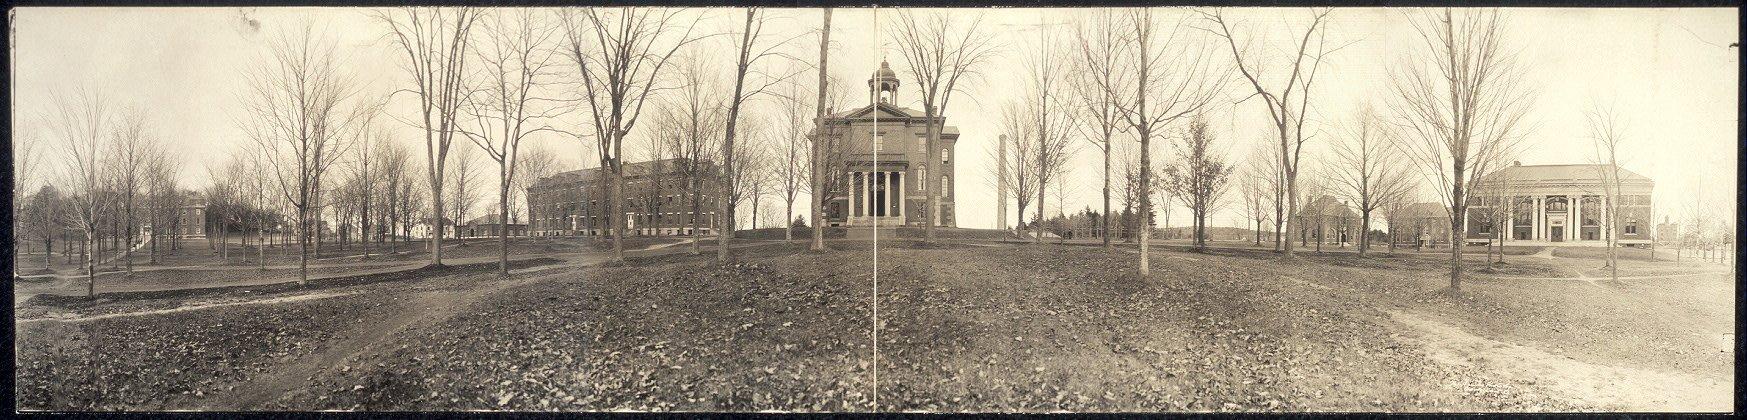 Photo Bates College, Lewiston, Me. 1910